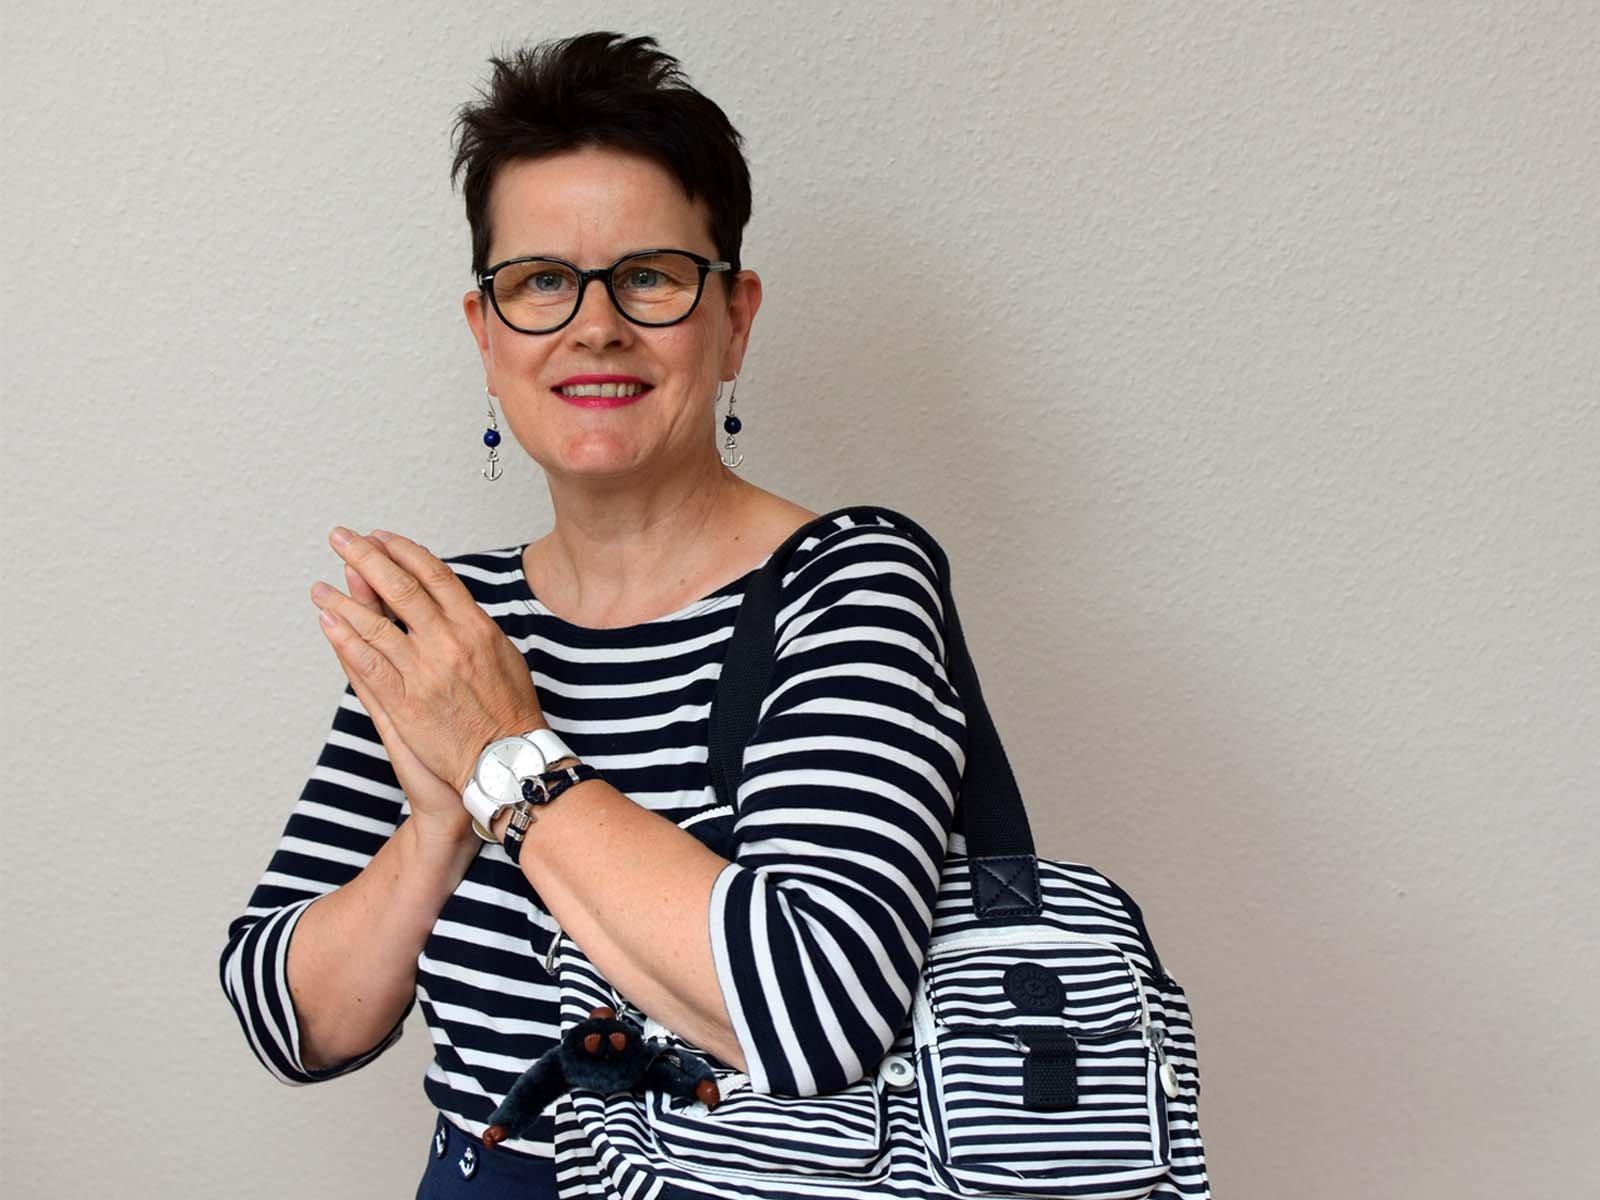 Ahoi! Rockabilly Matrosen Hose mit Ringelshirt – Sabine Gimm